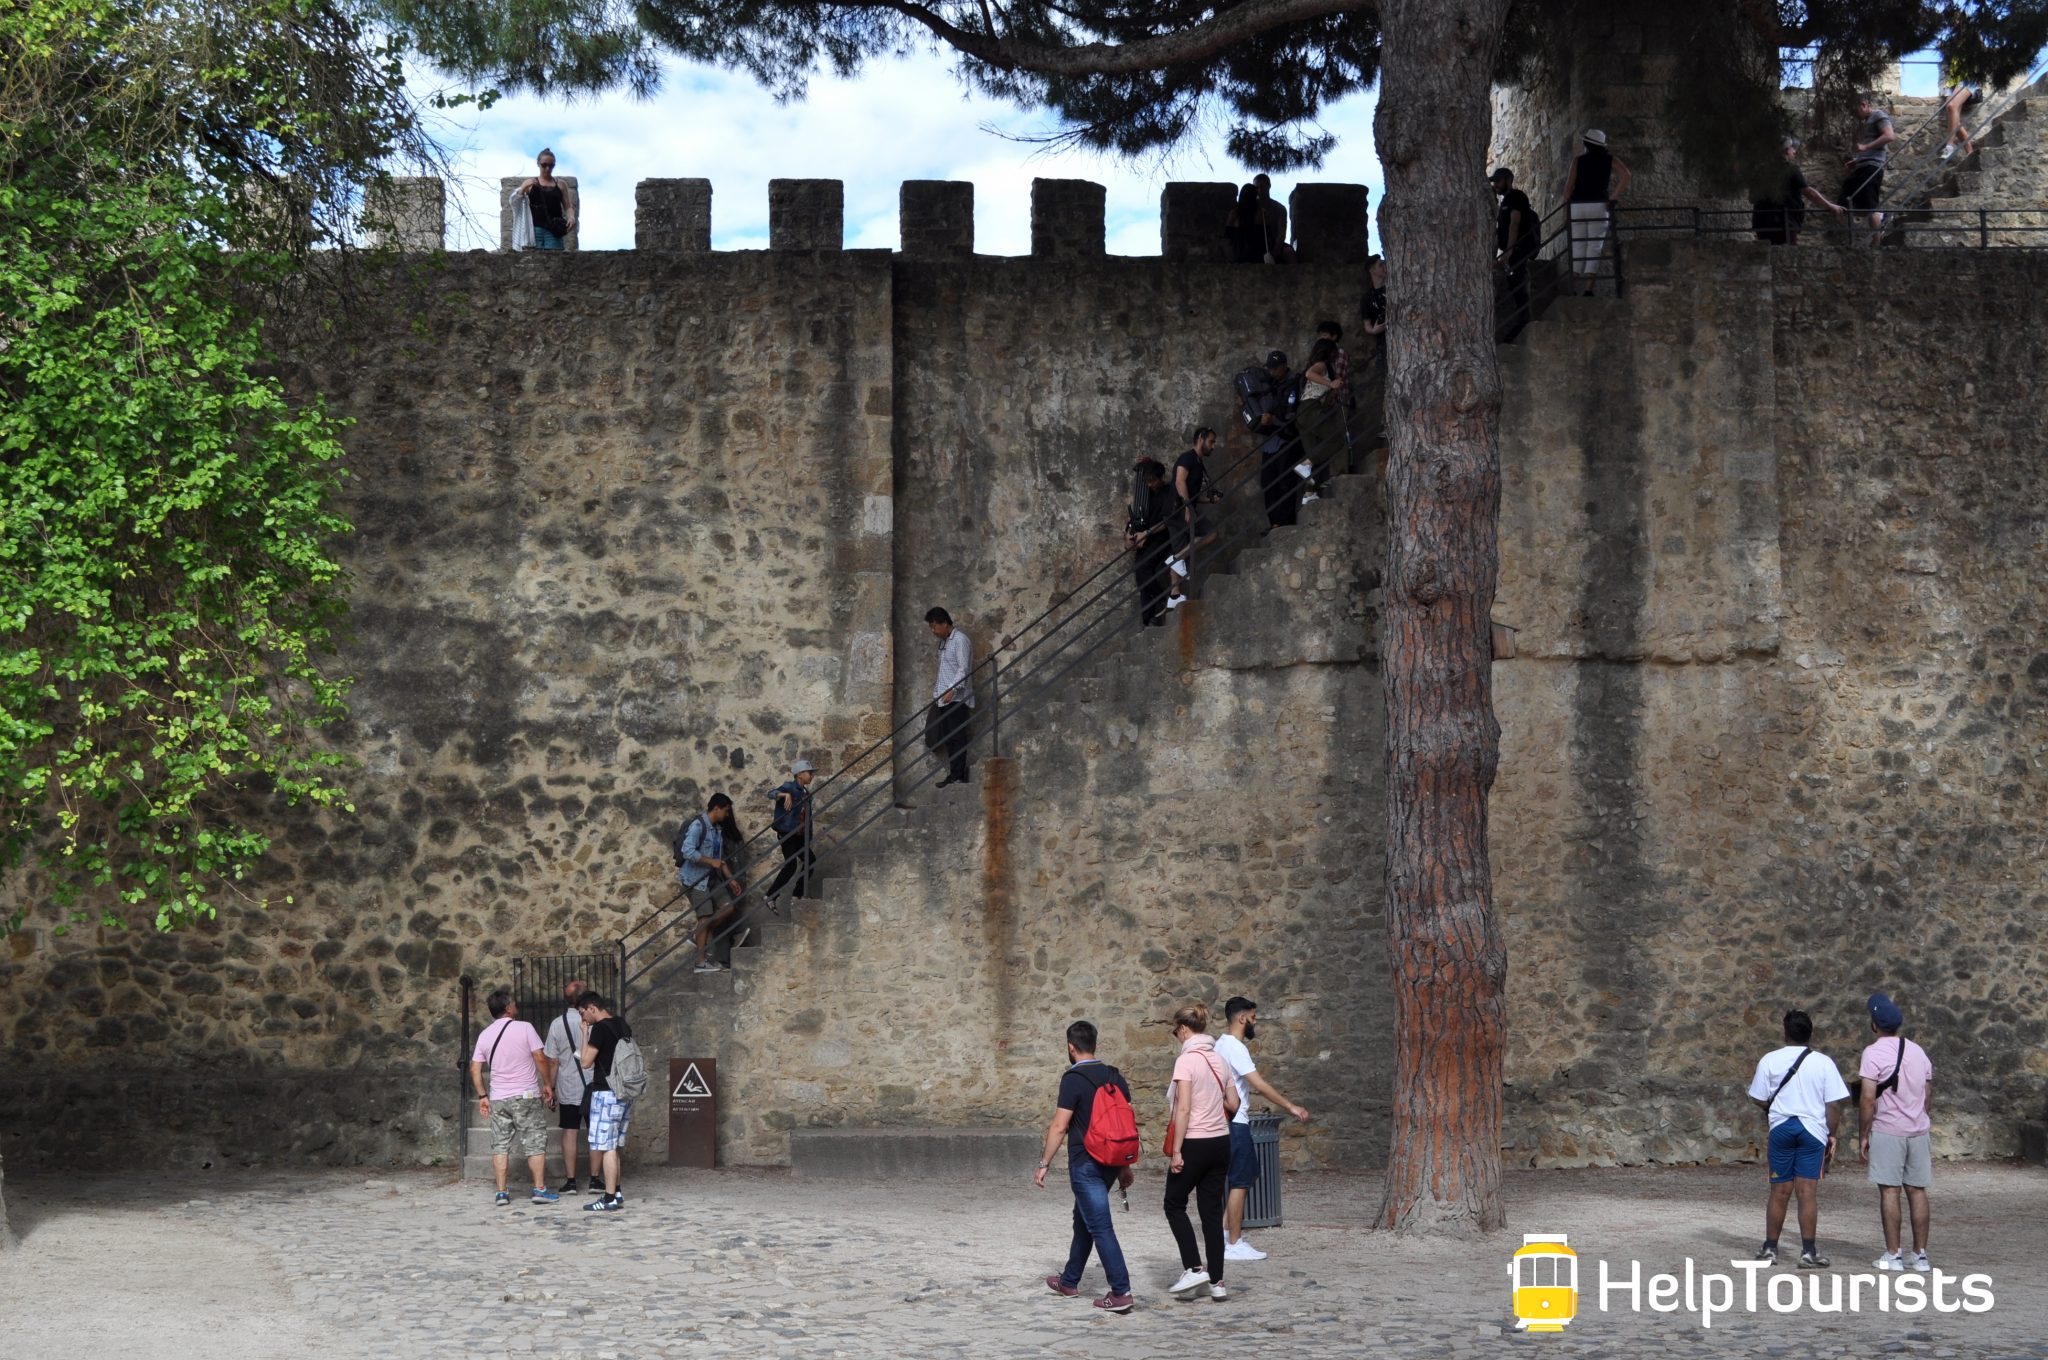 Lissabon Castelo de sao jorge Treppen